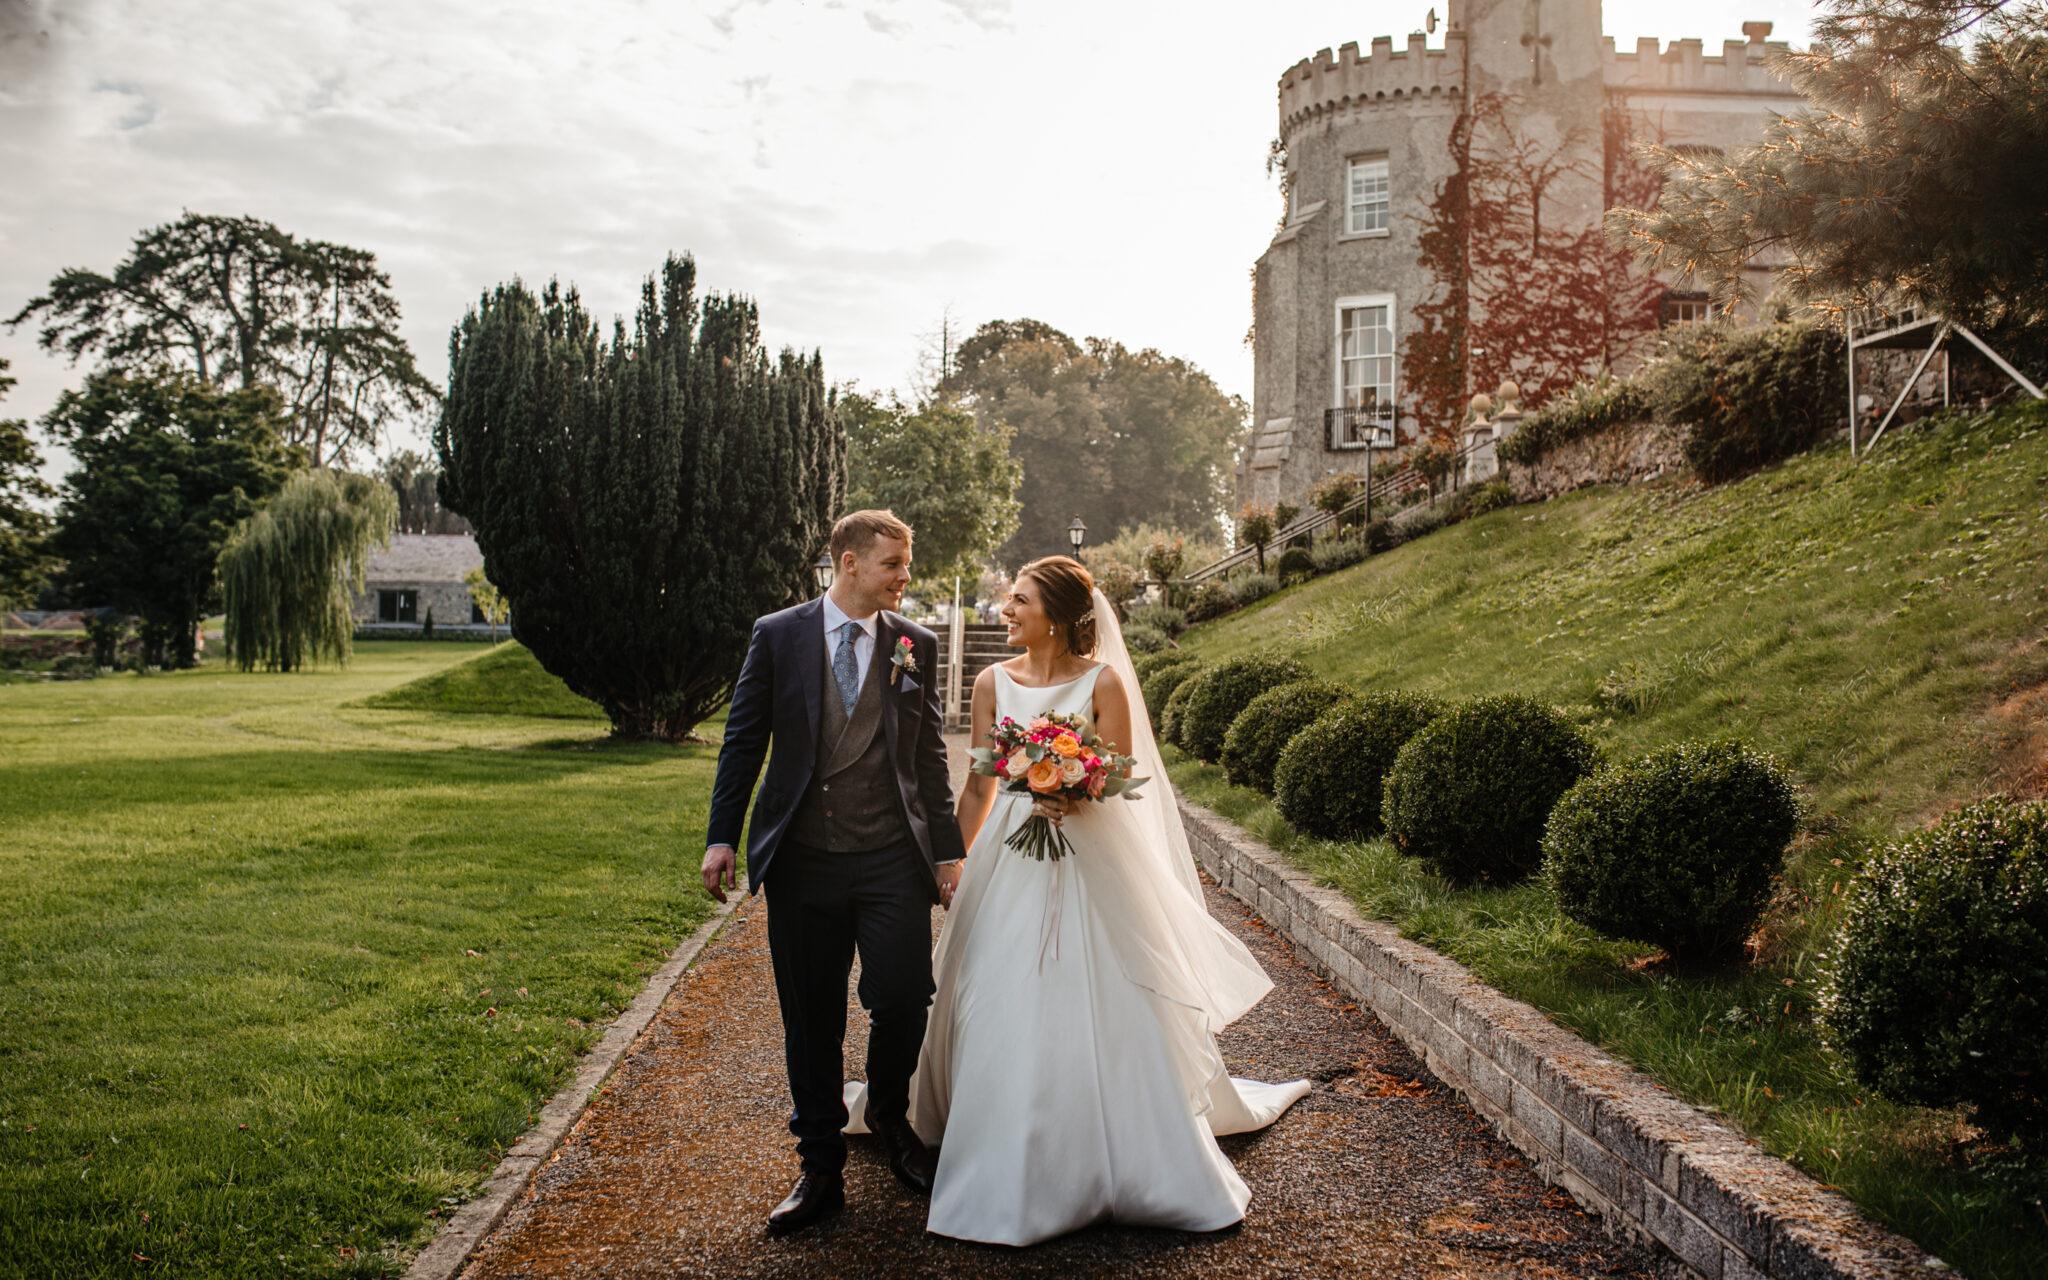 Bellingham Castle wedding photos